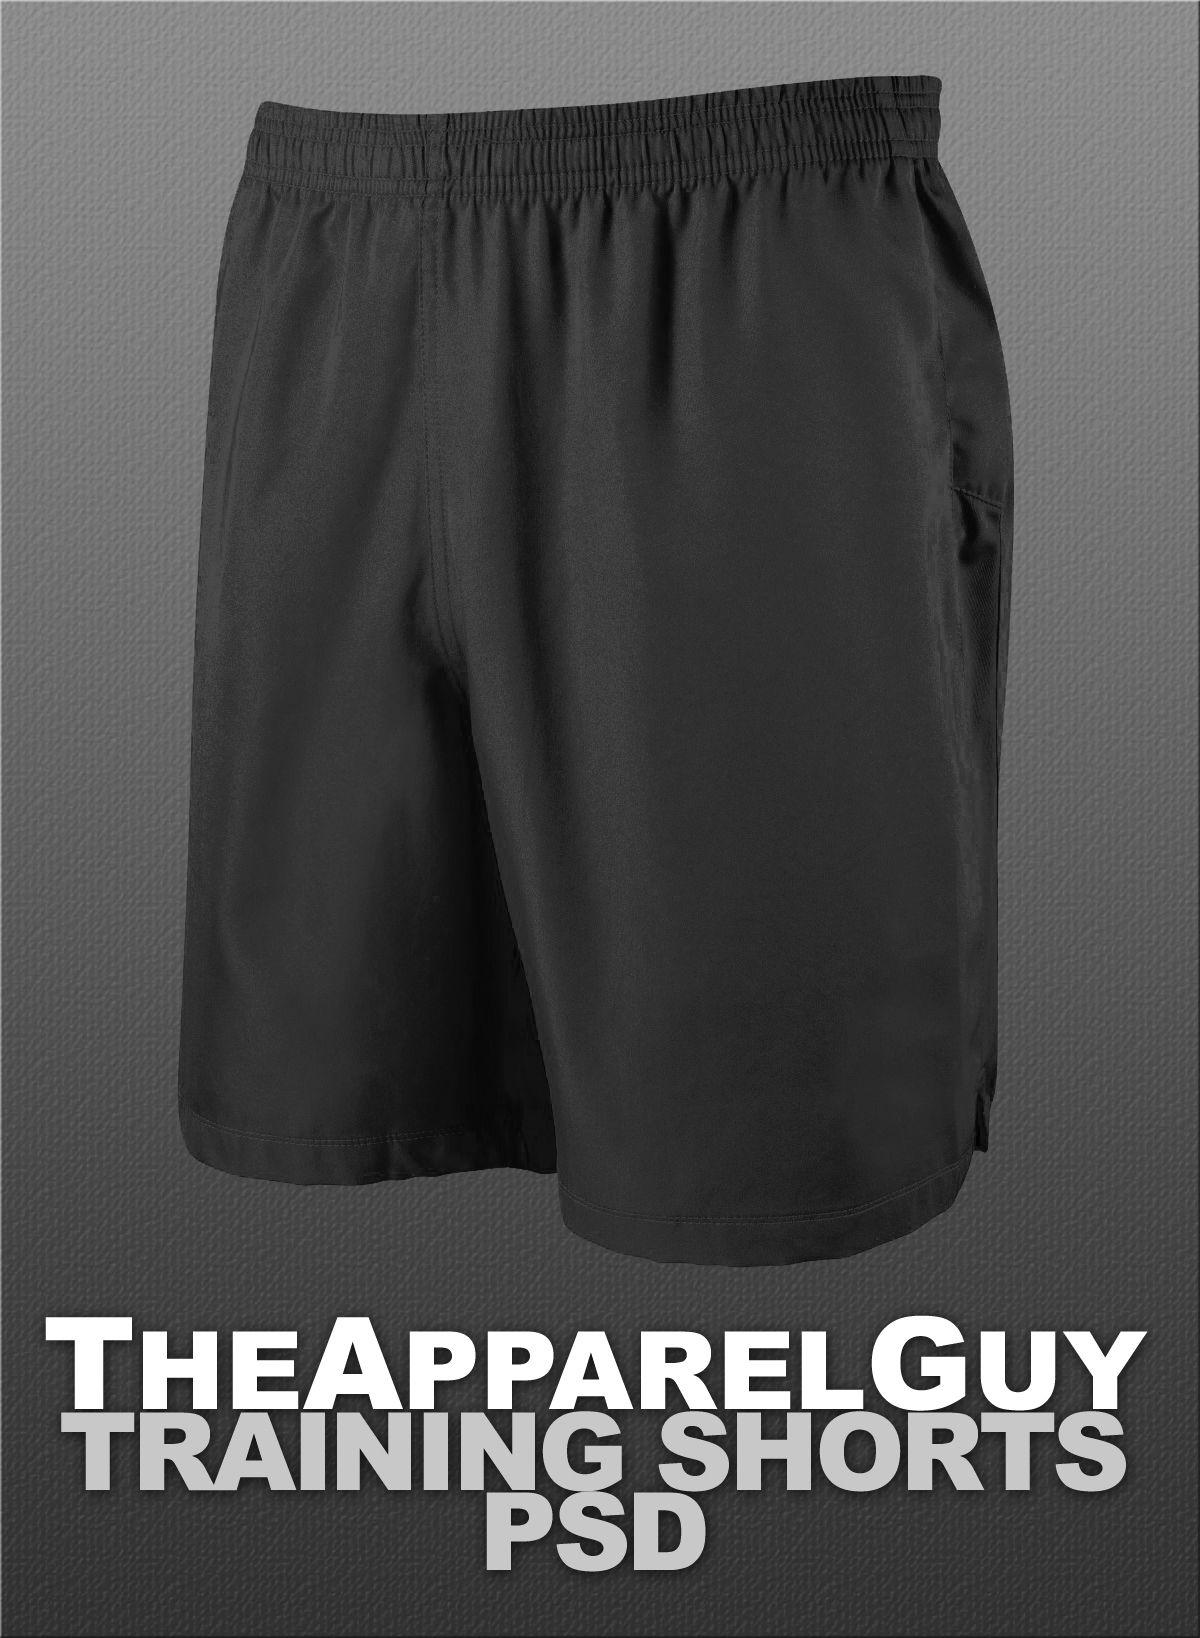 Download Training Shorts Psd Training Shorts Shorts Clothing Templates